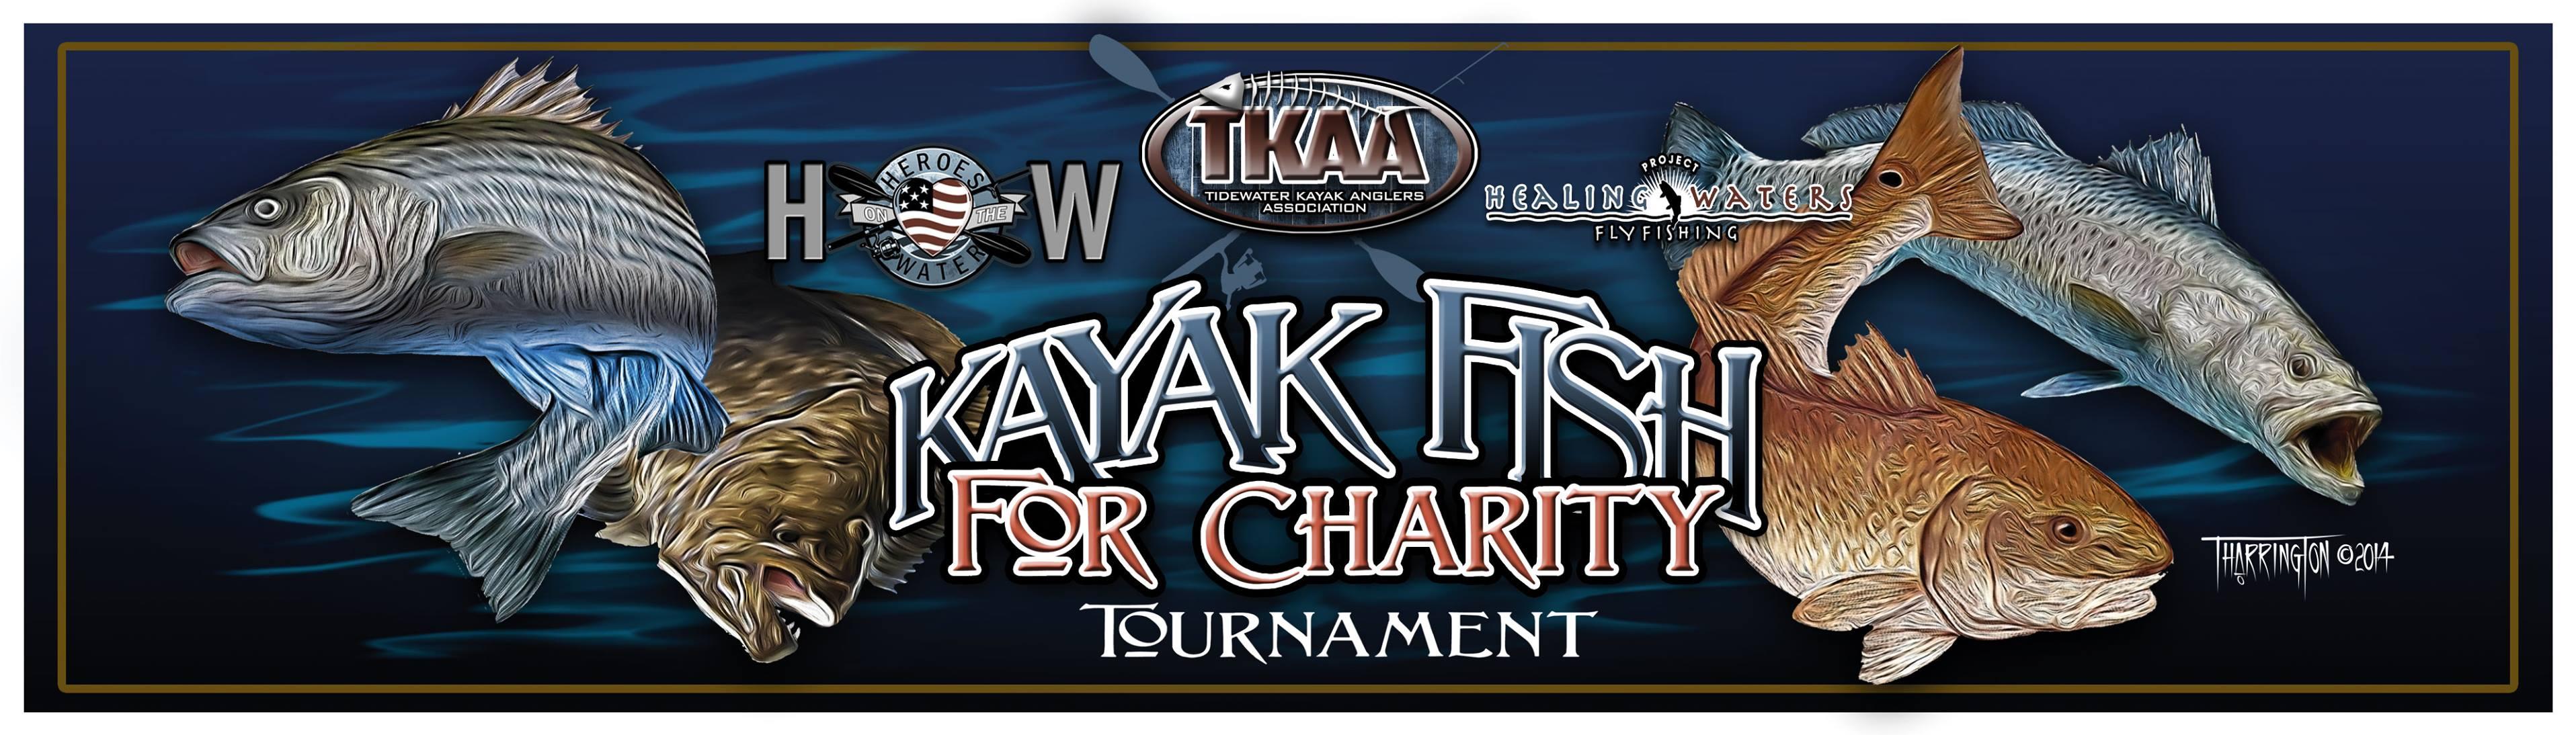 TKAA - Charity Tournament Bannera